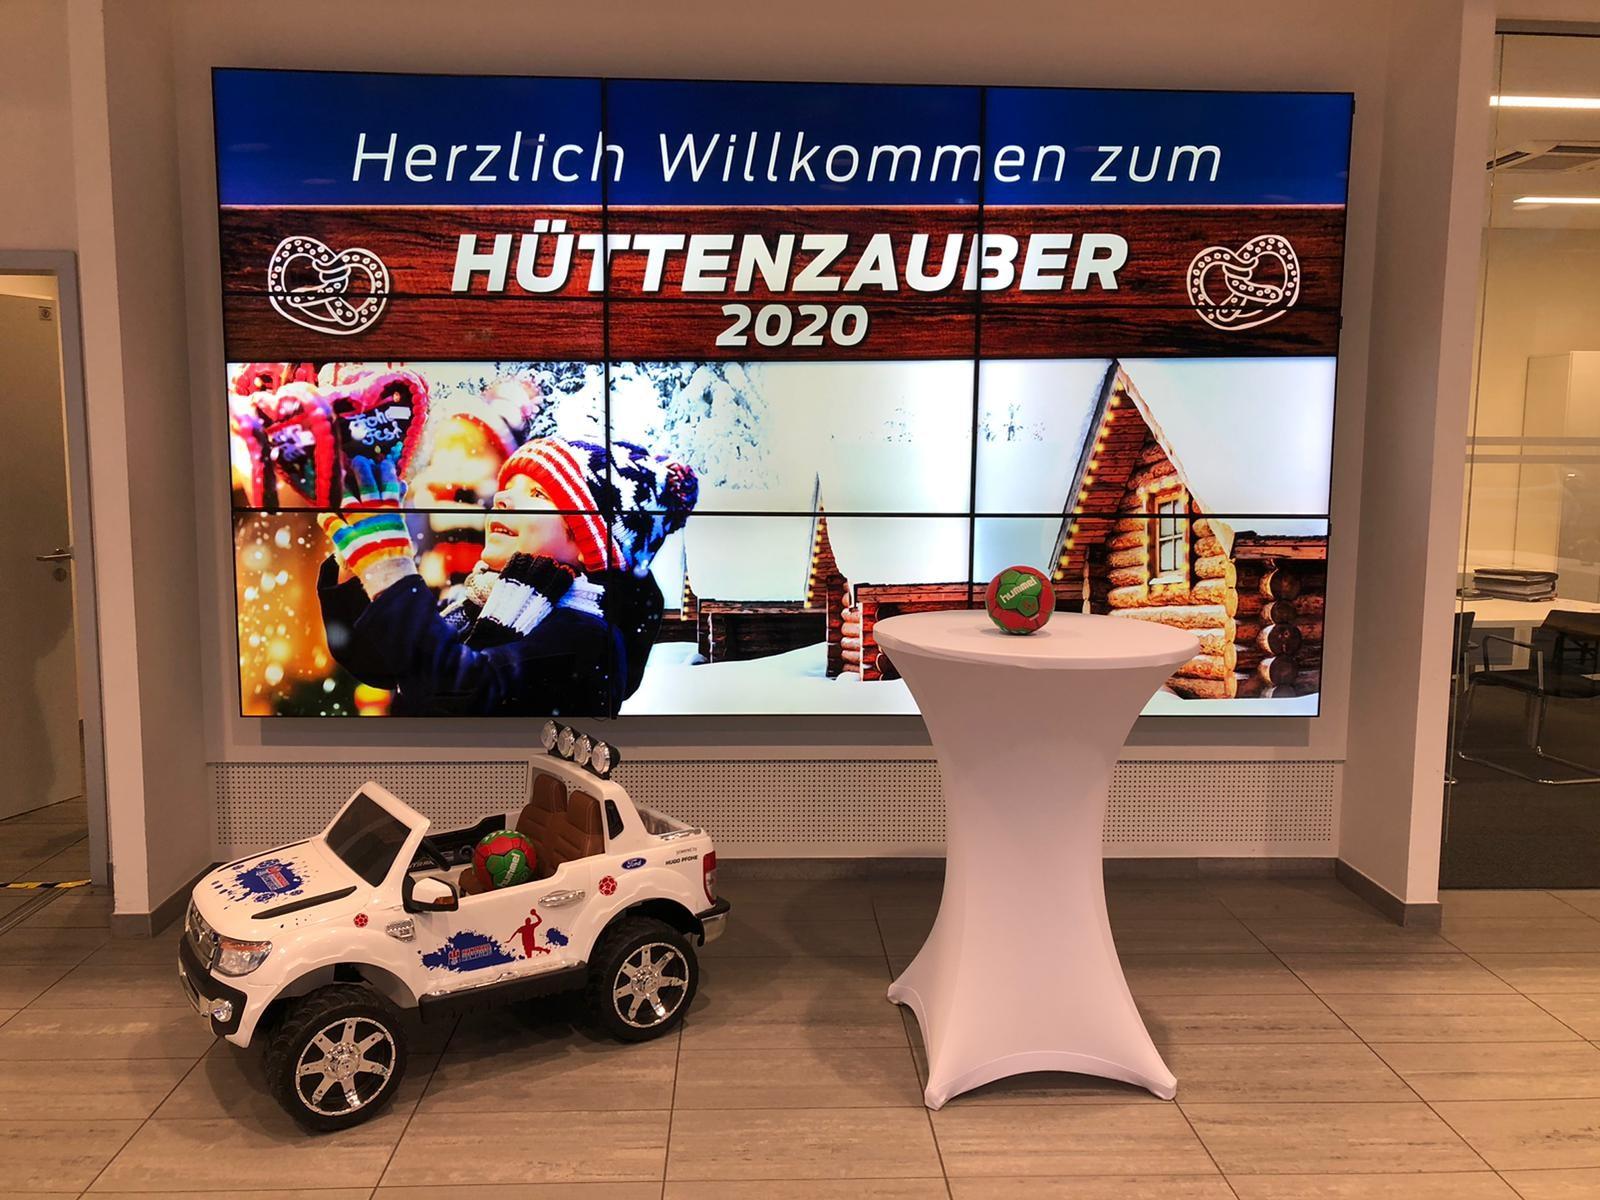 Hugo Pfohe Hüttenzauber 2020